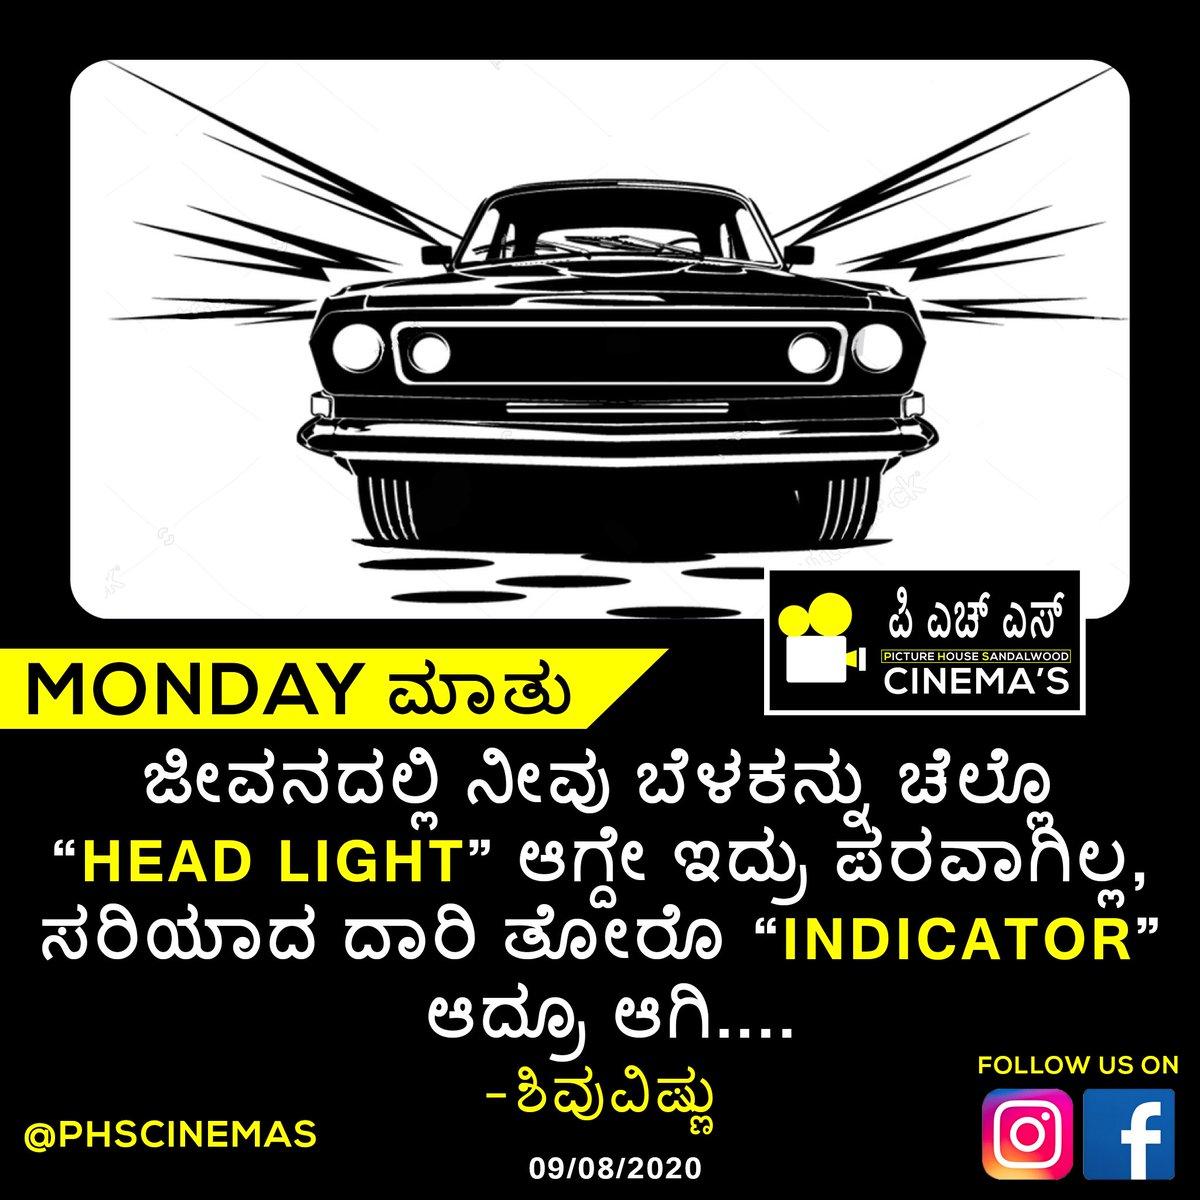 Monday ಮಾತು - M12 #phs #phscinemas #quotes #kannadaquotes #mondaymotivation #mondaymorning #monday #mondayquotespic.twitter.com/afL3rsoCyv